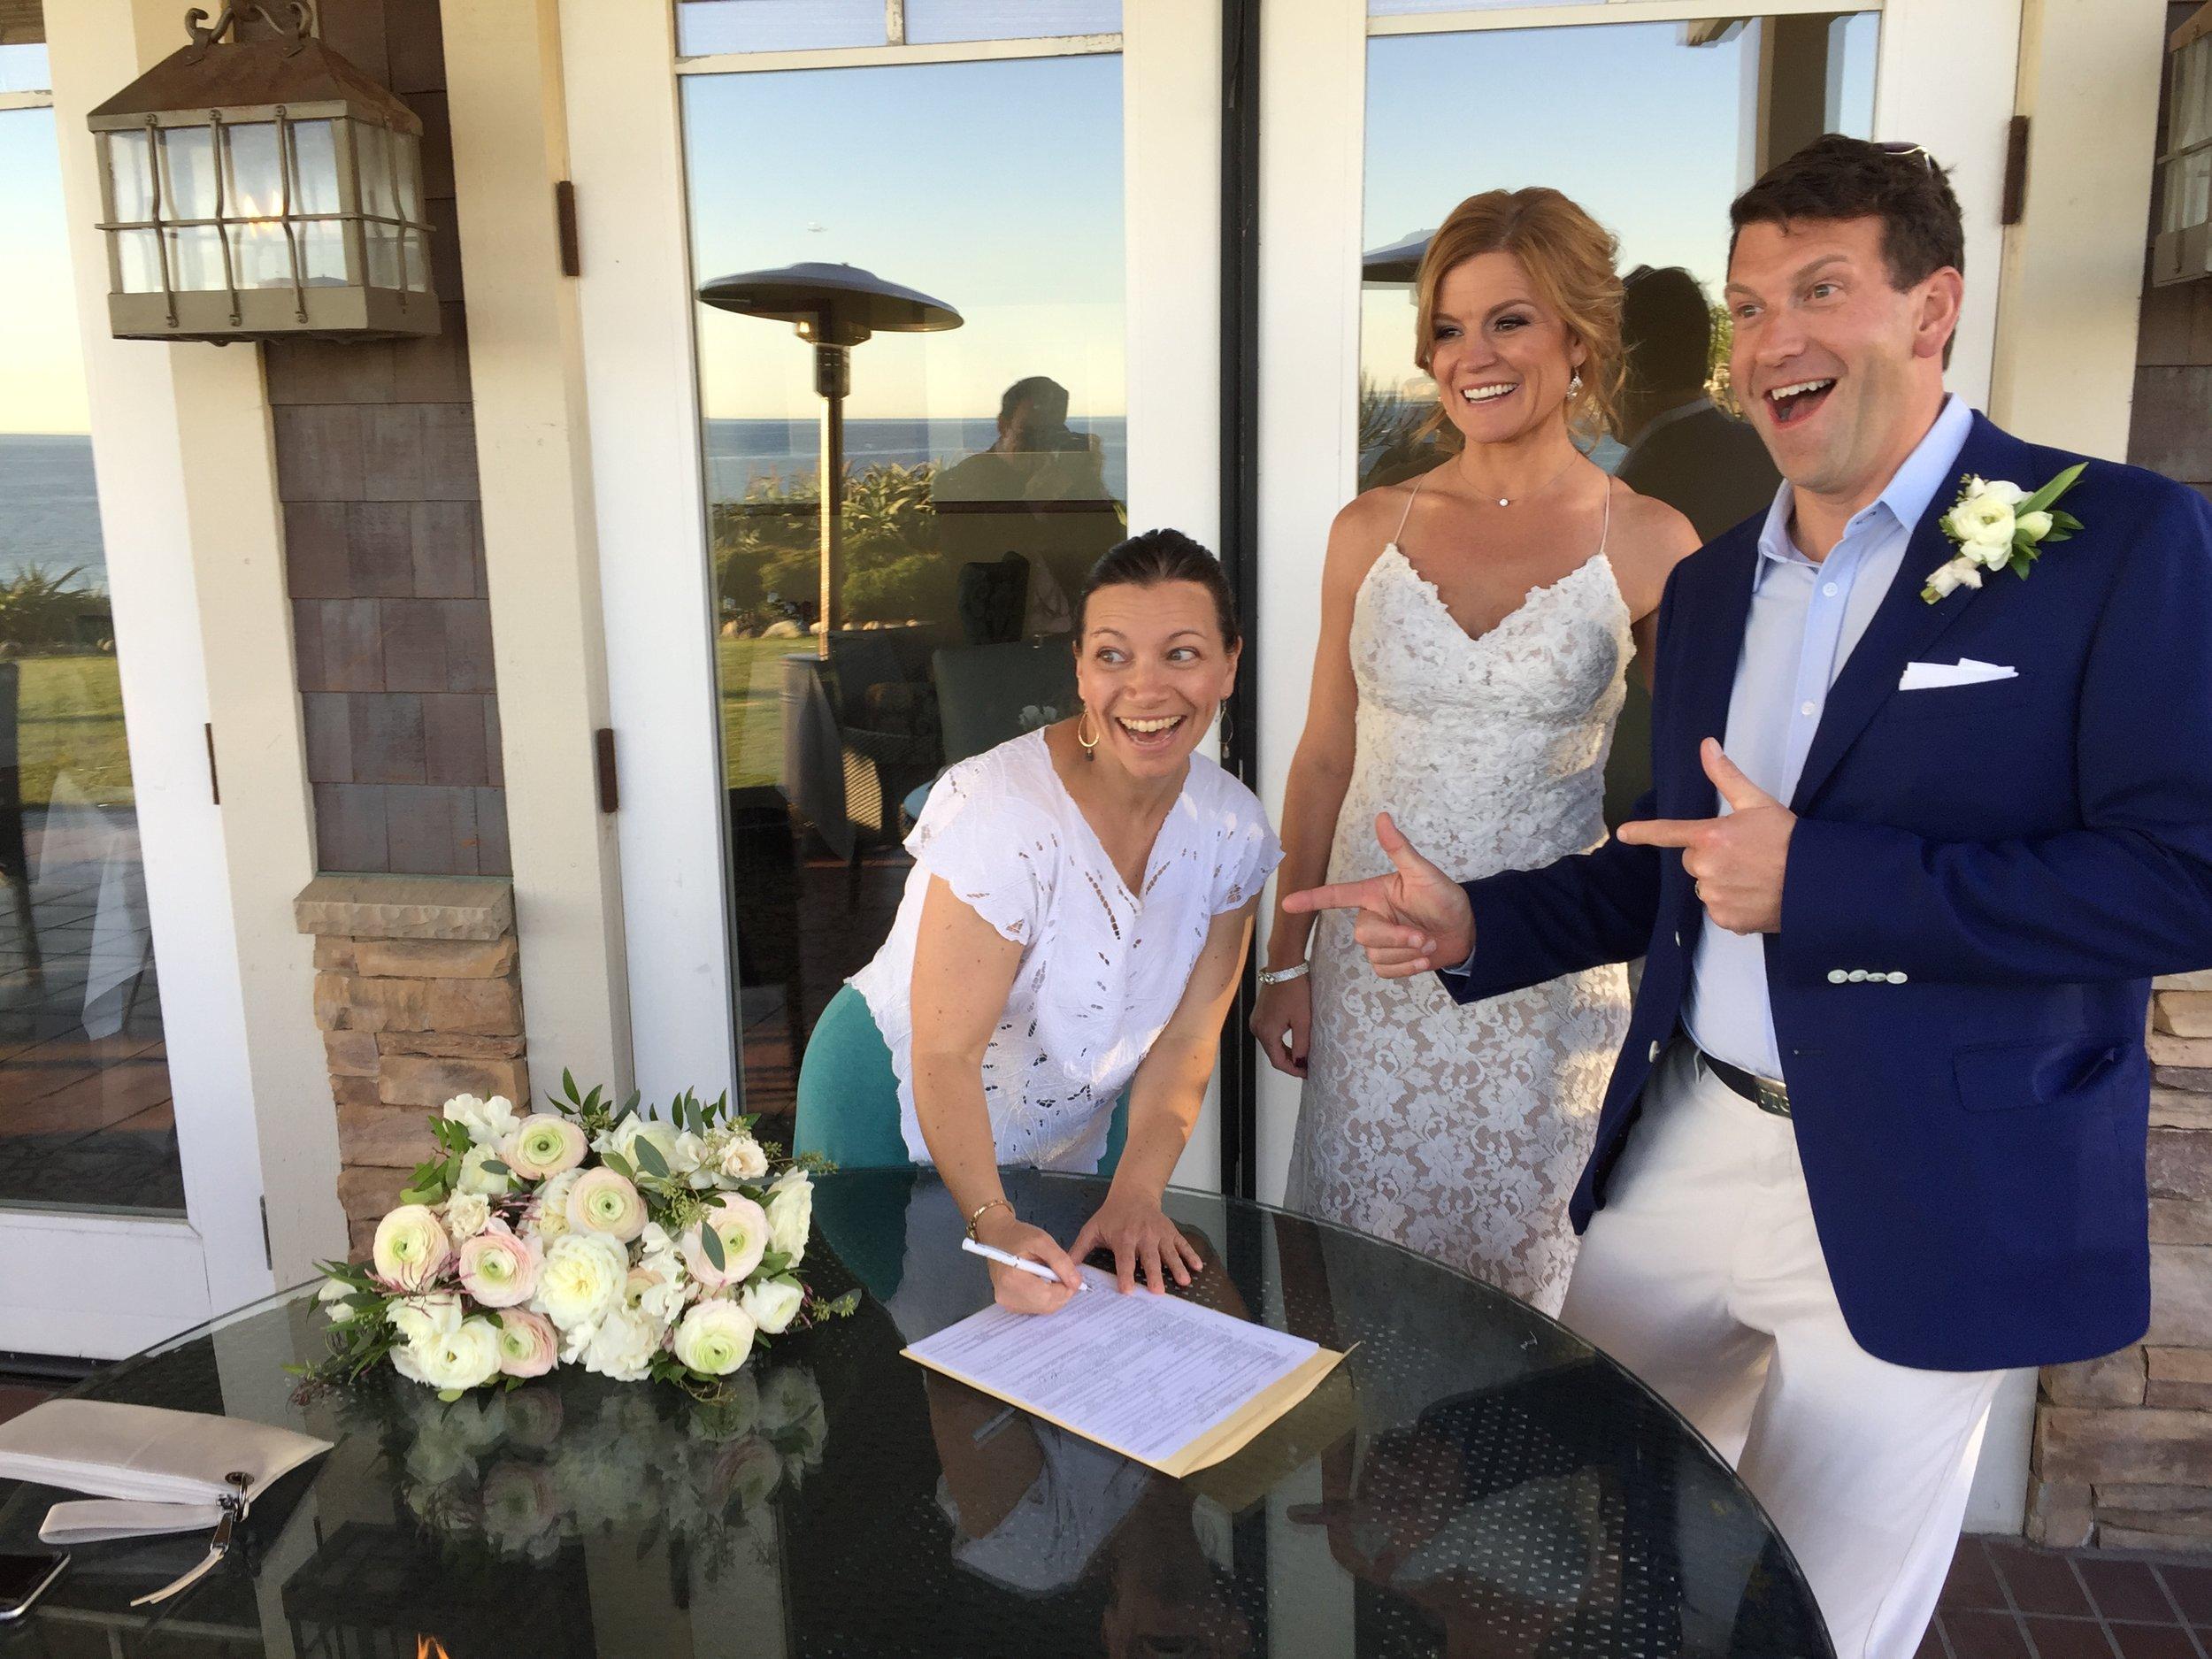 Teresa and Jamies wedding signing licence.JPG